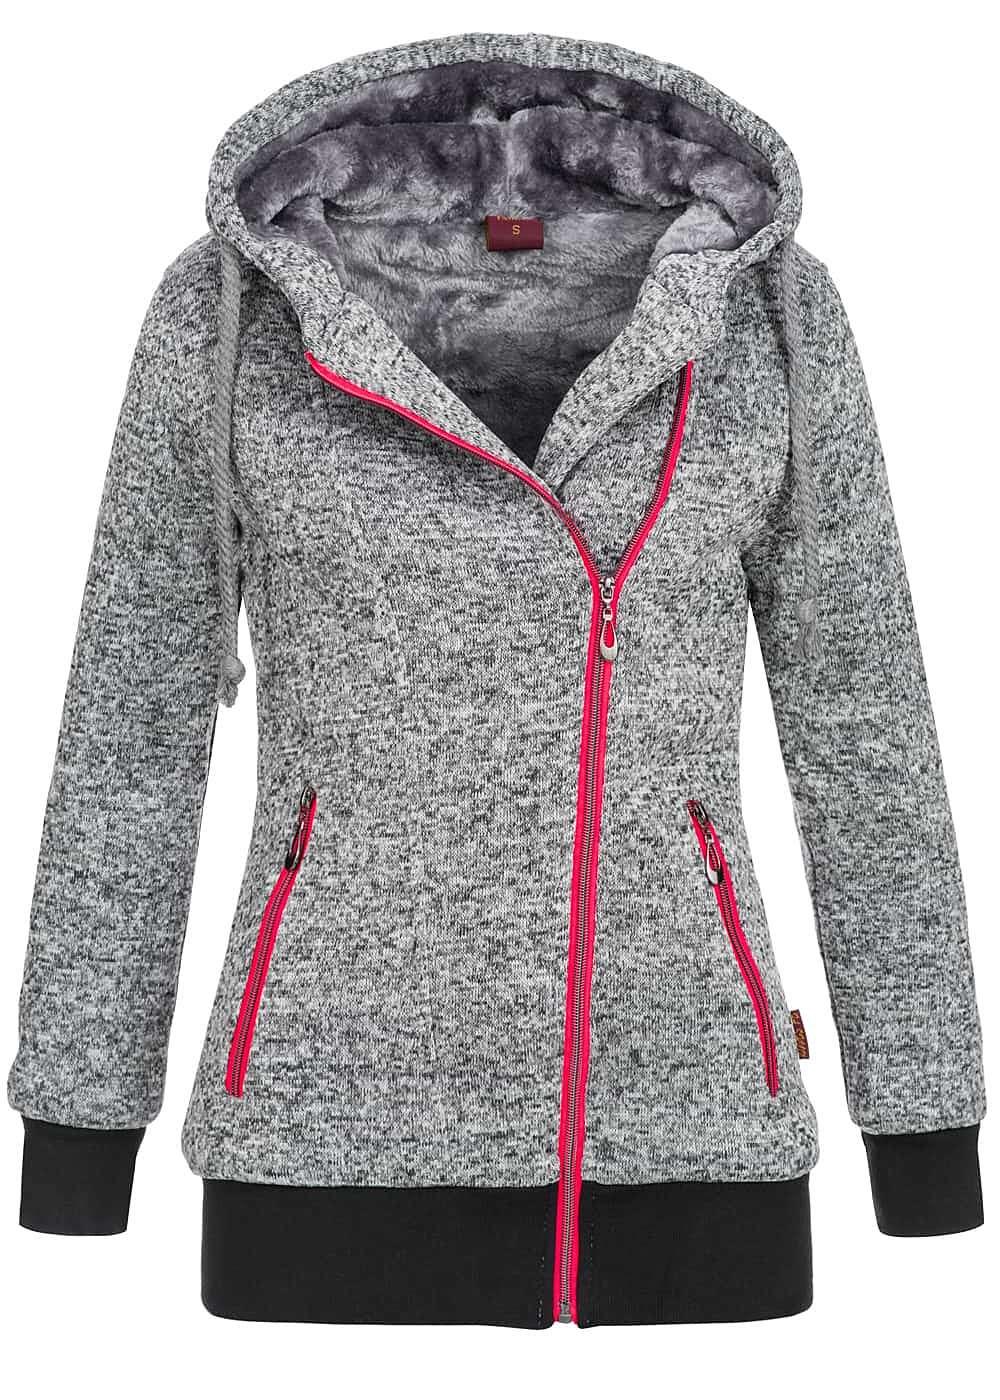 seventyseven lifestyle damen winter zip hoodie mit kapuze. Black Bedroom Furniture Sets. Home Design Ideas